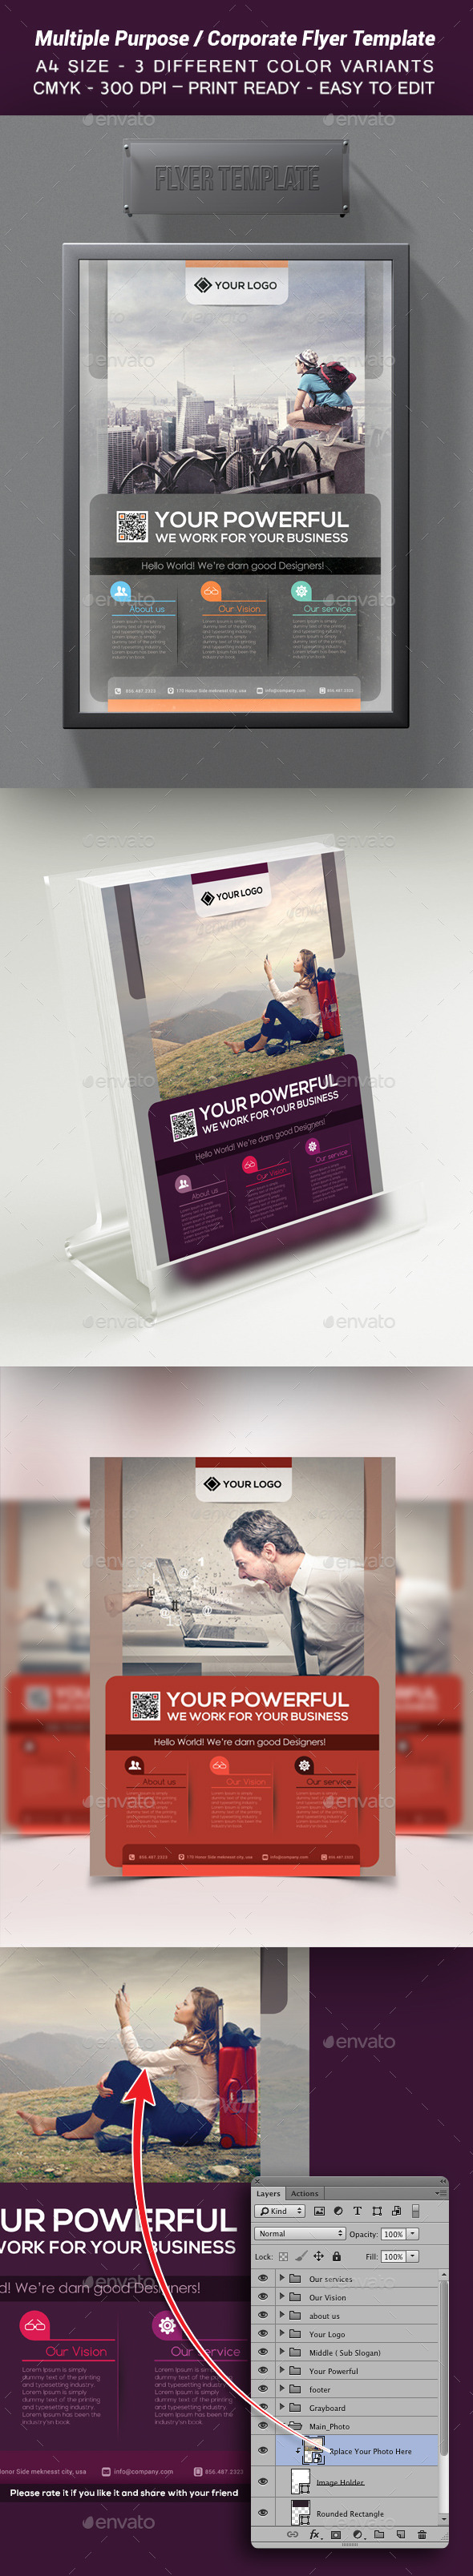 GraphicRiver Multiple Purpose Corporate Flyer Template 9600163